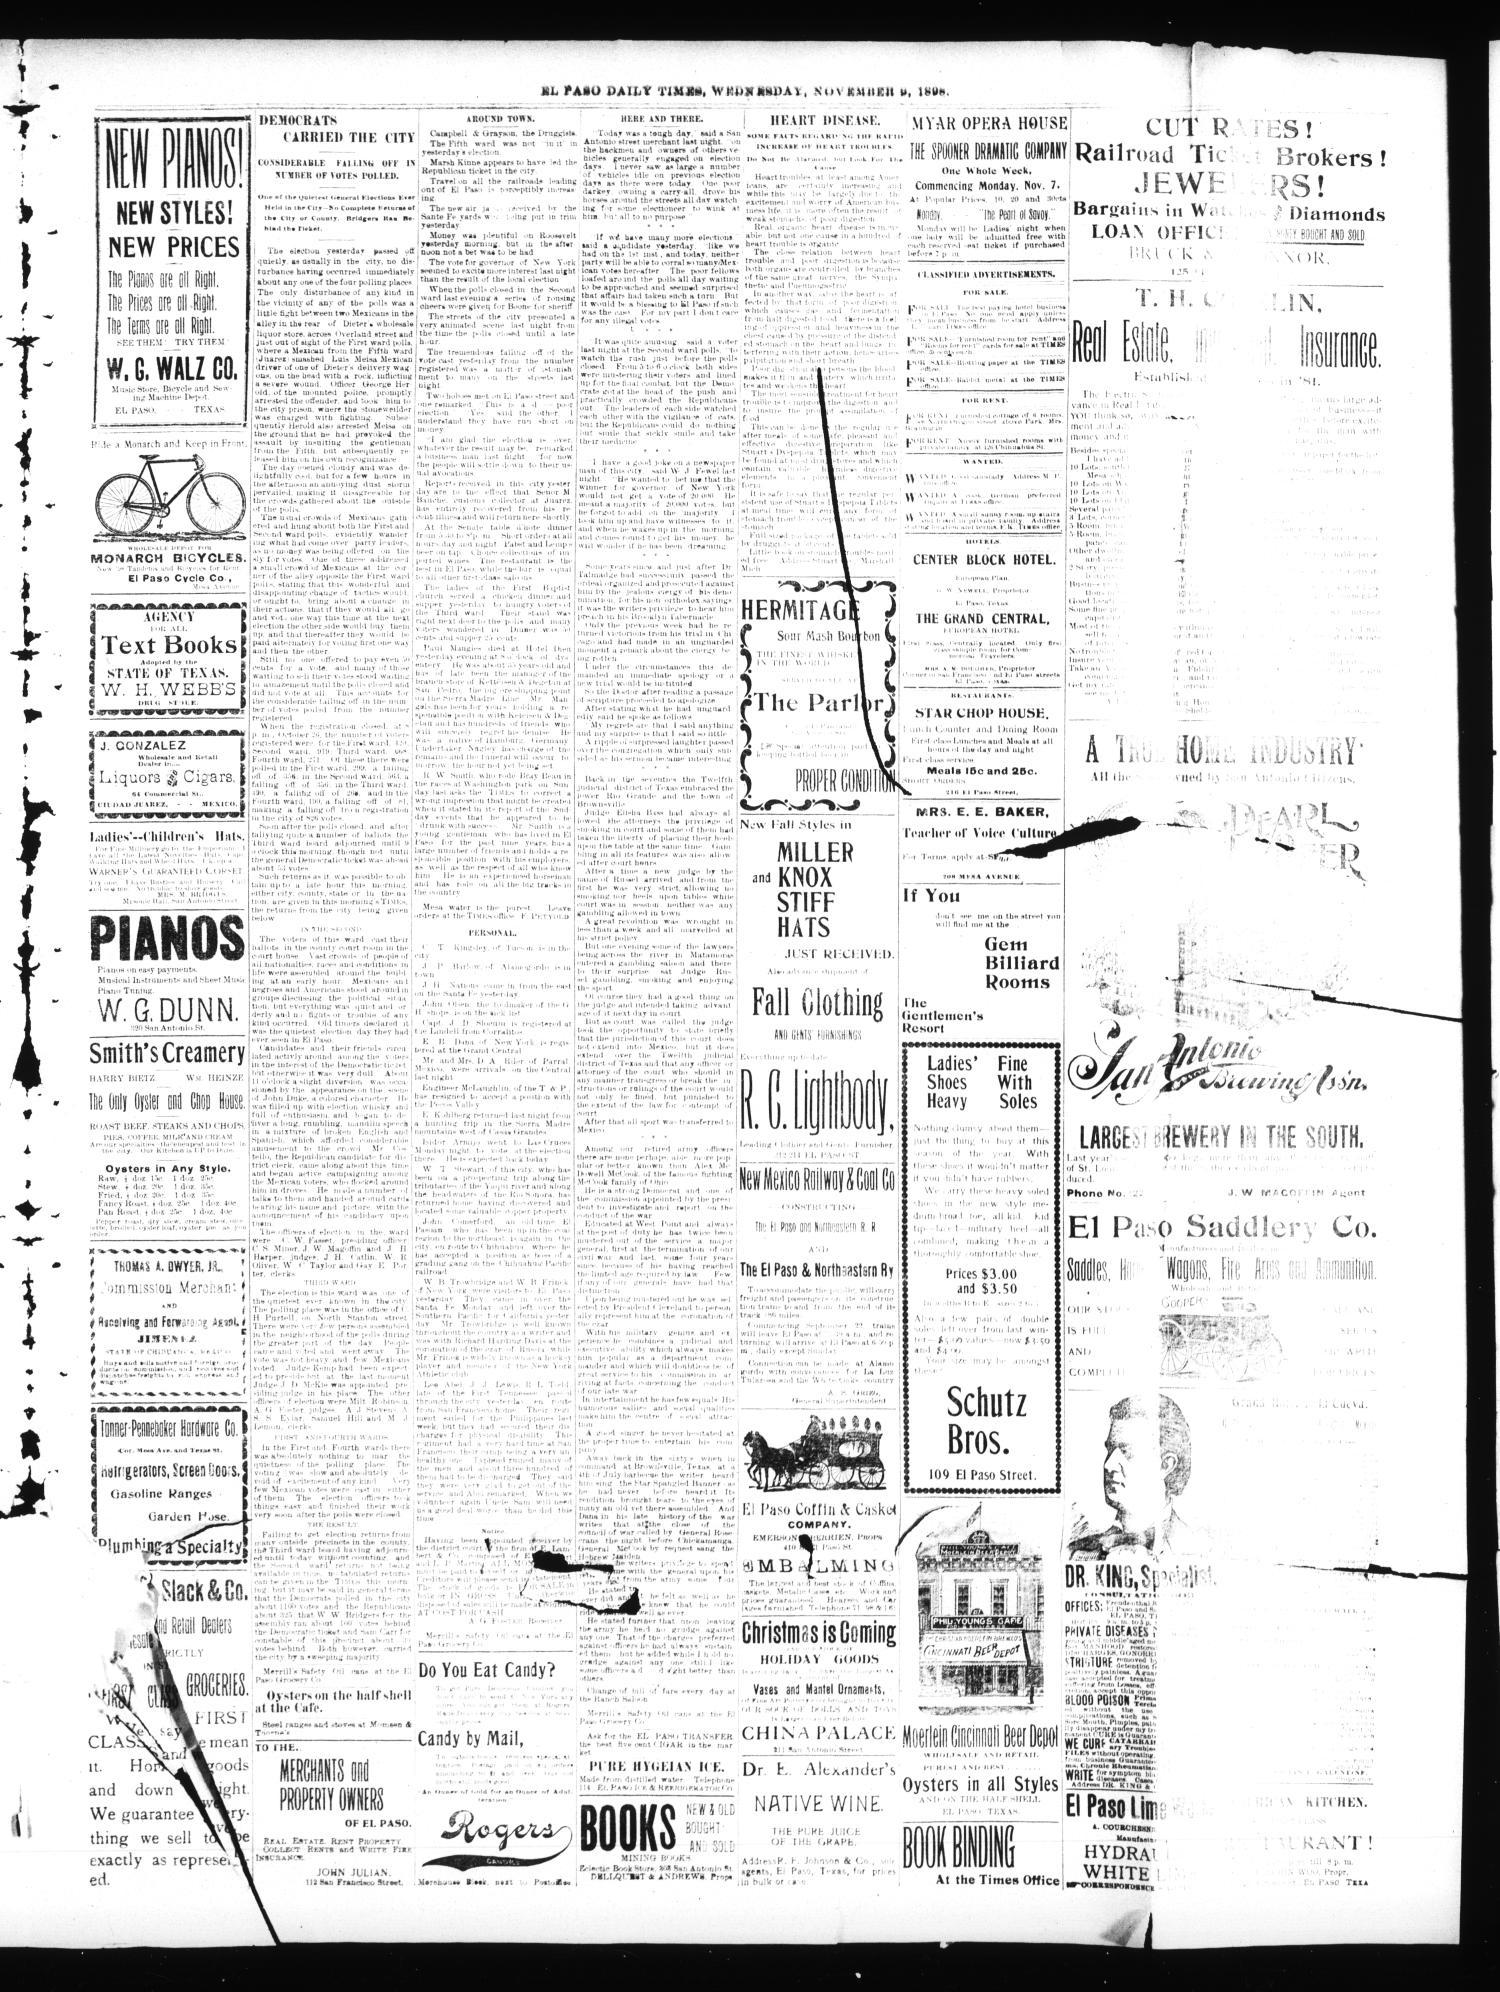 hight resolution of el paso international daily times el paso tex vol 18 no 268 ed 1 wednesday november 9 1898 page 3 of 4 the portal to texas history